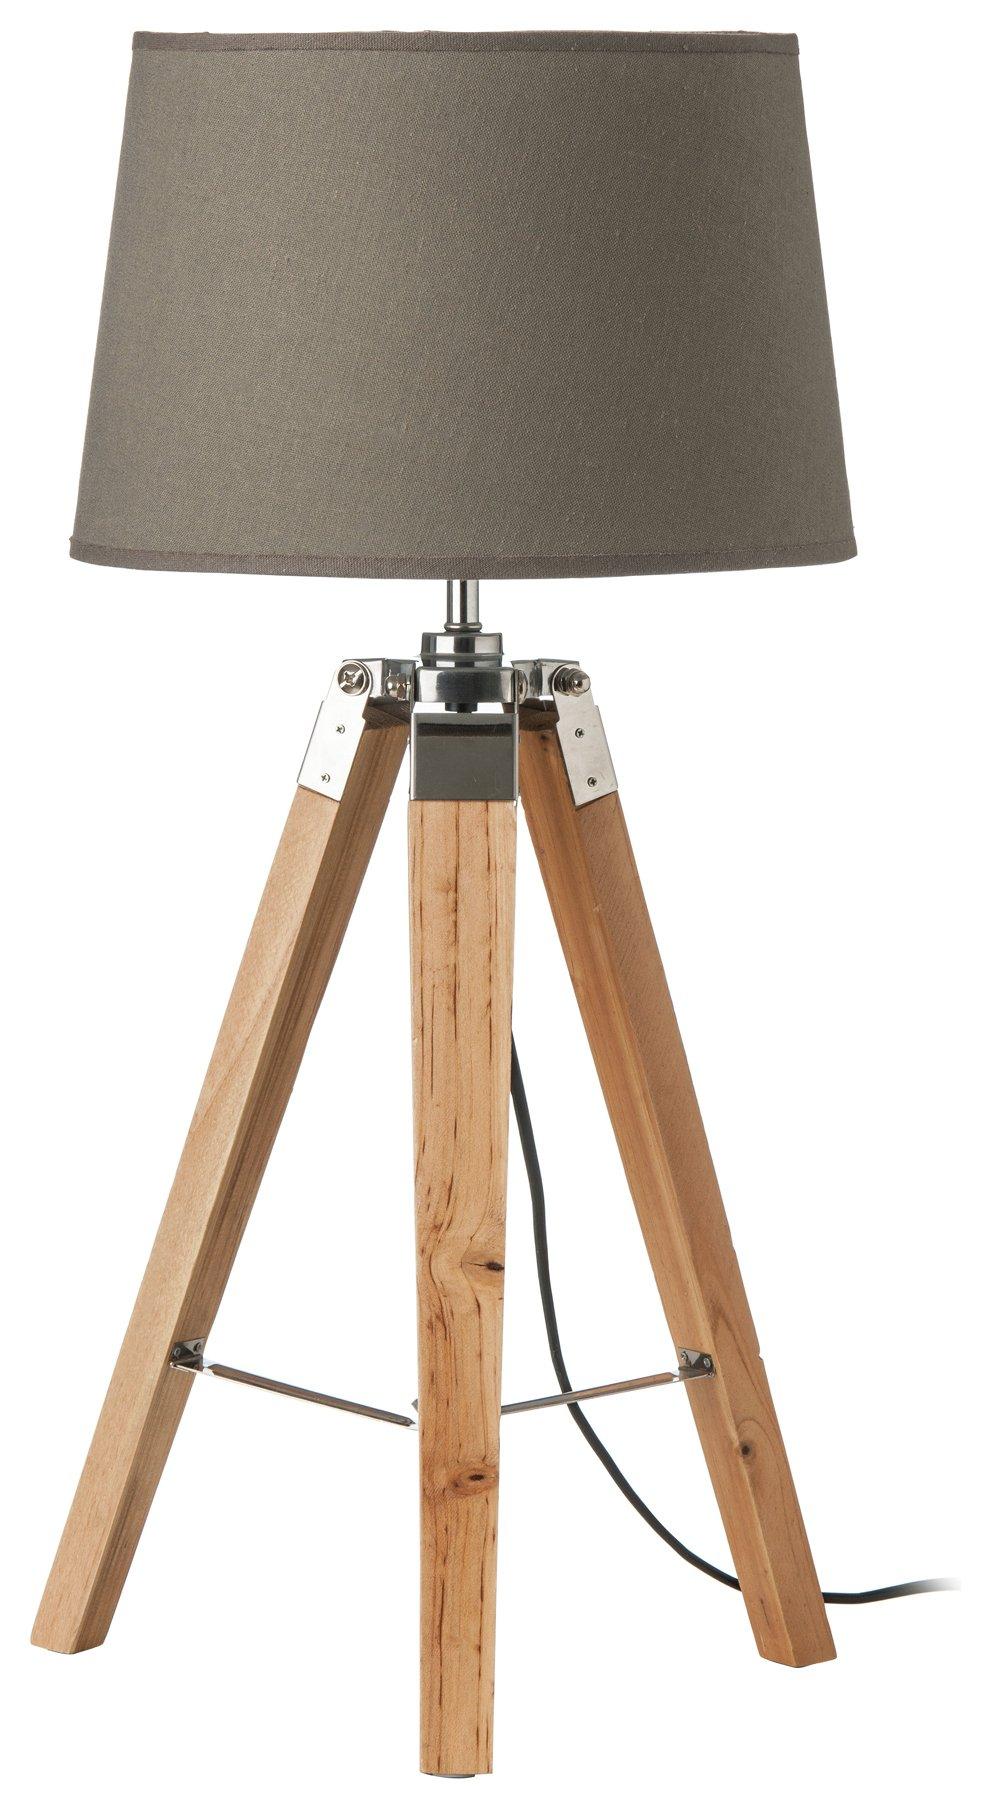 Image of Wood Base Tripod - Table Lamp - Grey